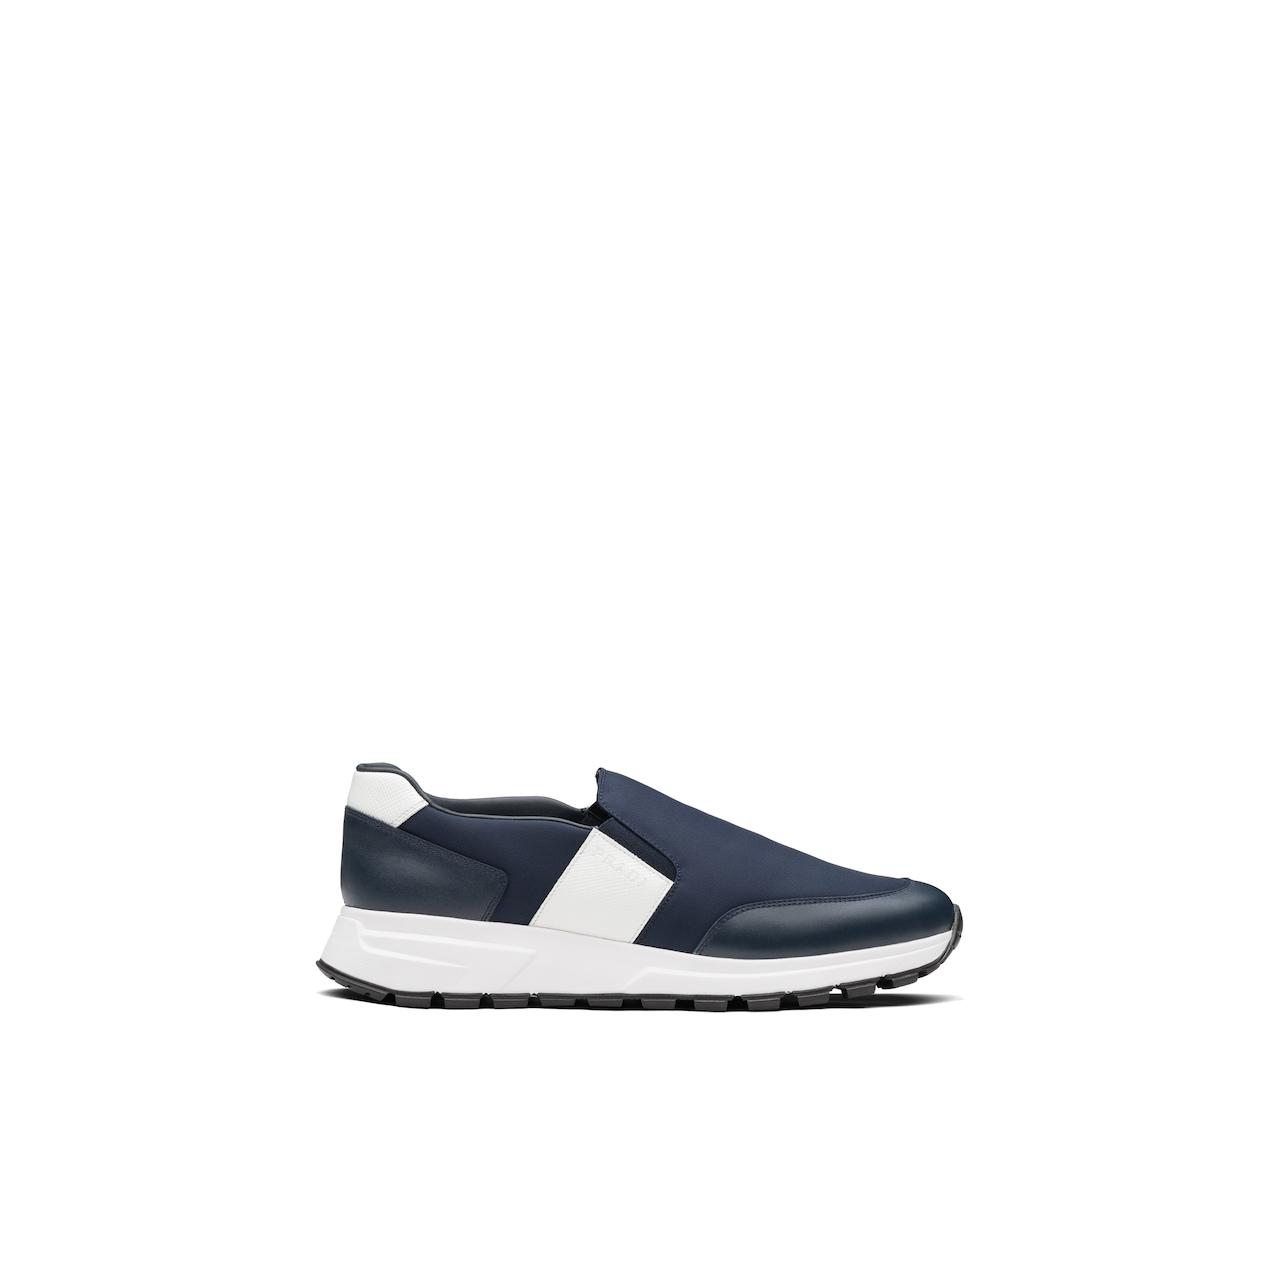 Prada 皮革和尼龙运动鞋 2